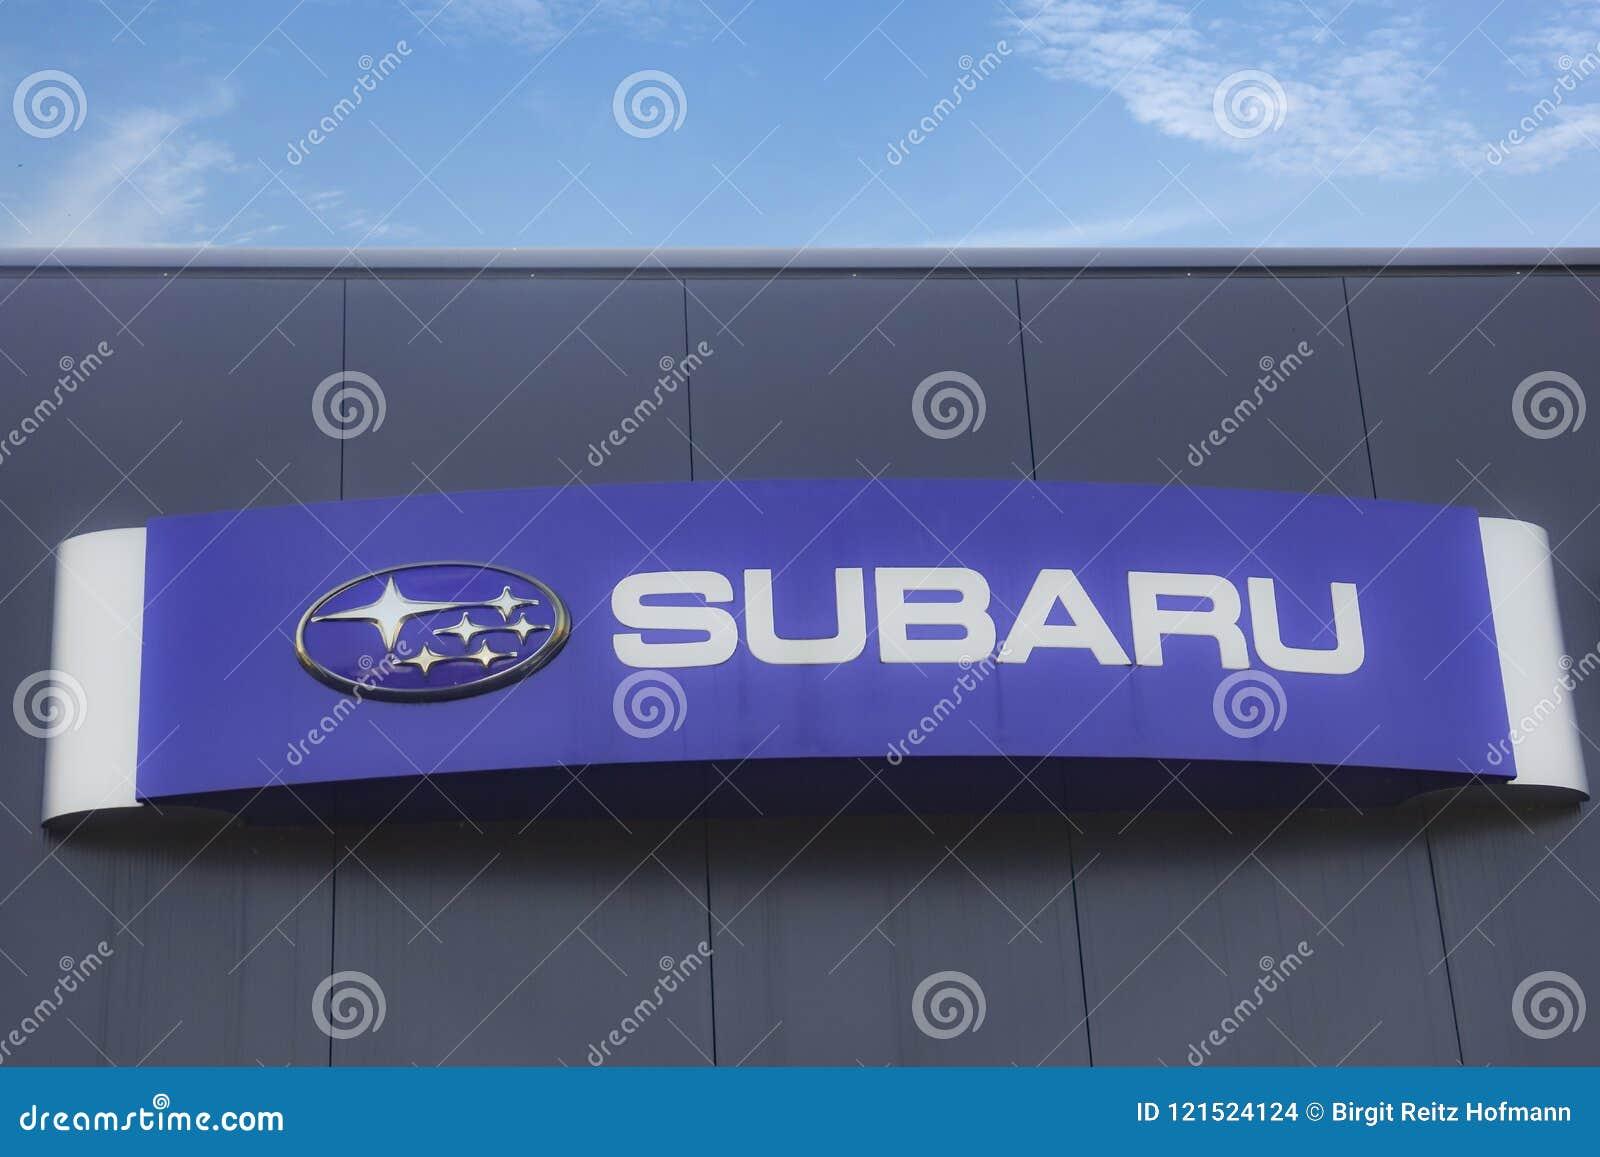 Subaru Logo On Facade Editorial Stock Image Image Of Motor 121524124